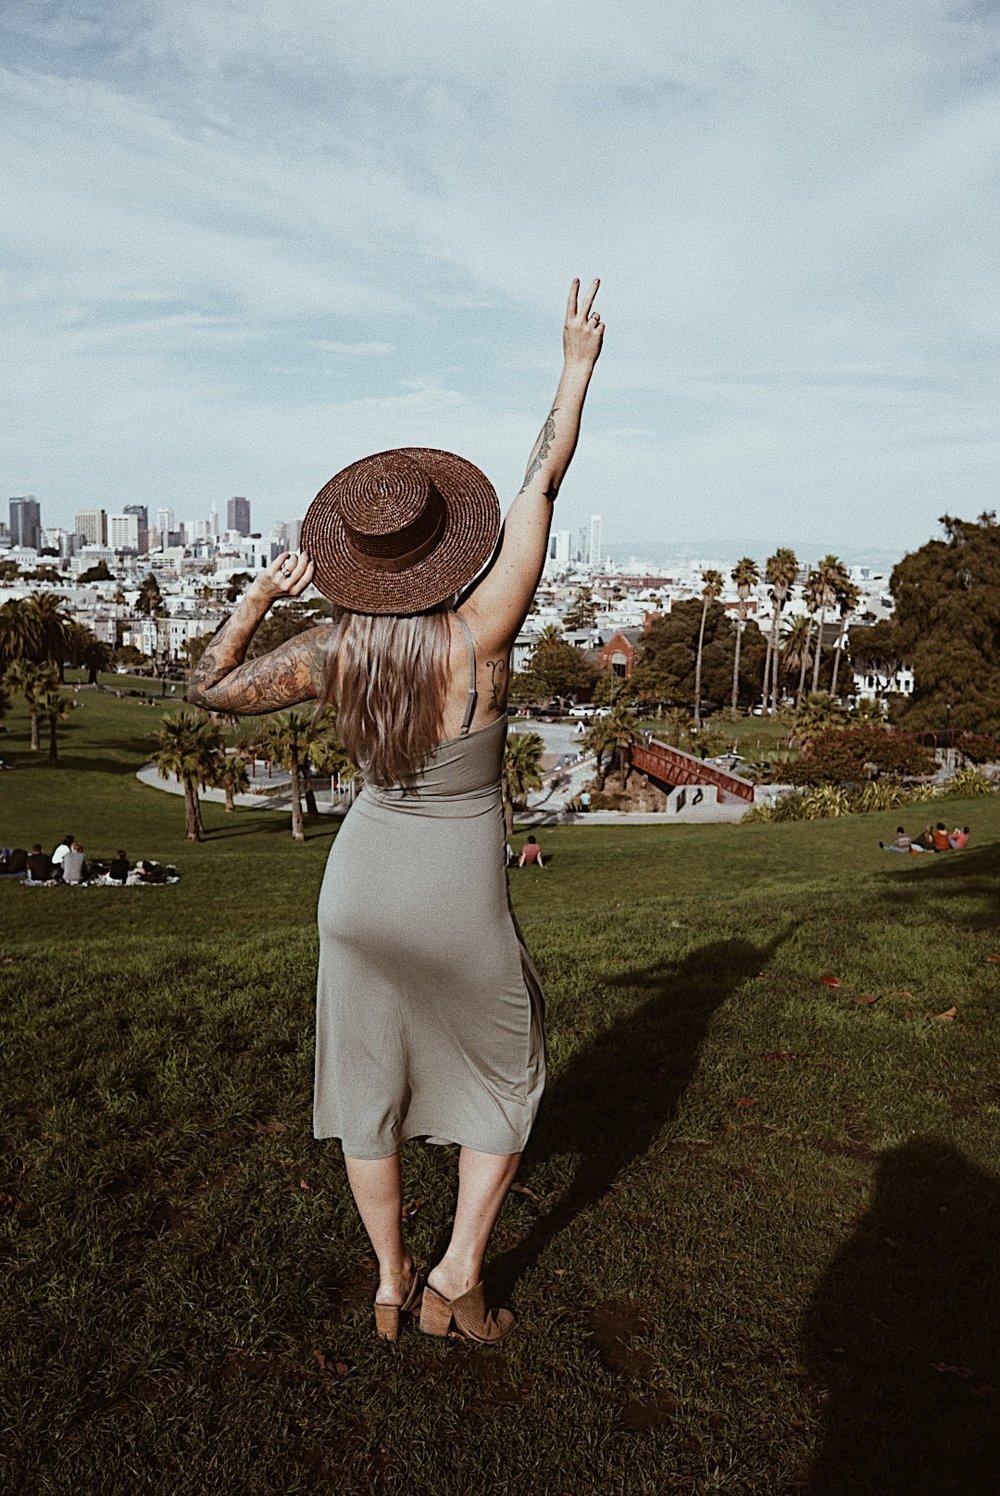 julia o test top san francisco peaks for instagram photos dolores park